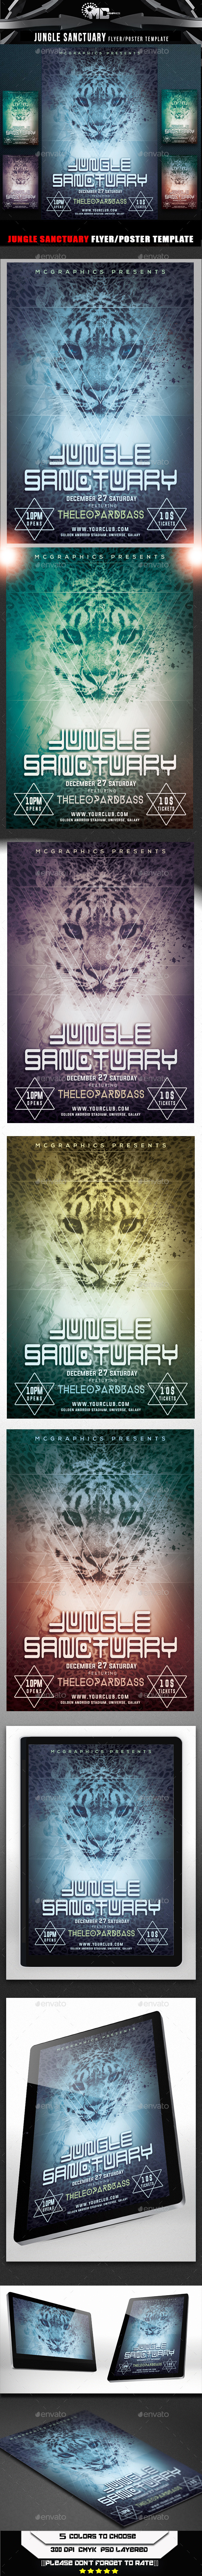 Jungle Sanctuary Flyer Template - Flyers Print Templates